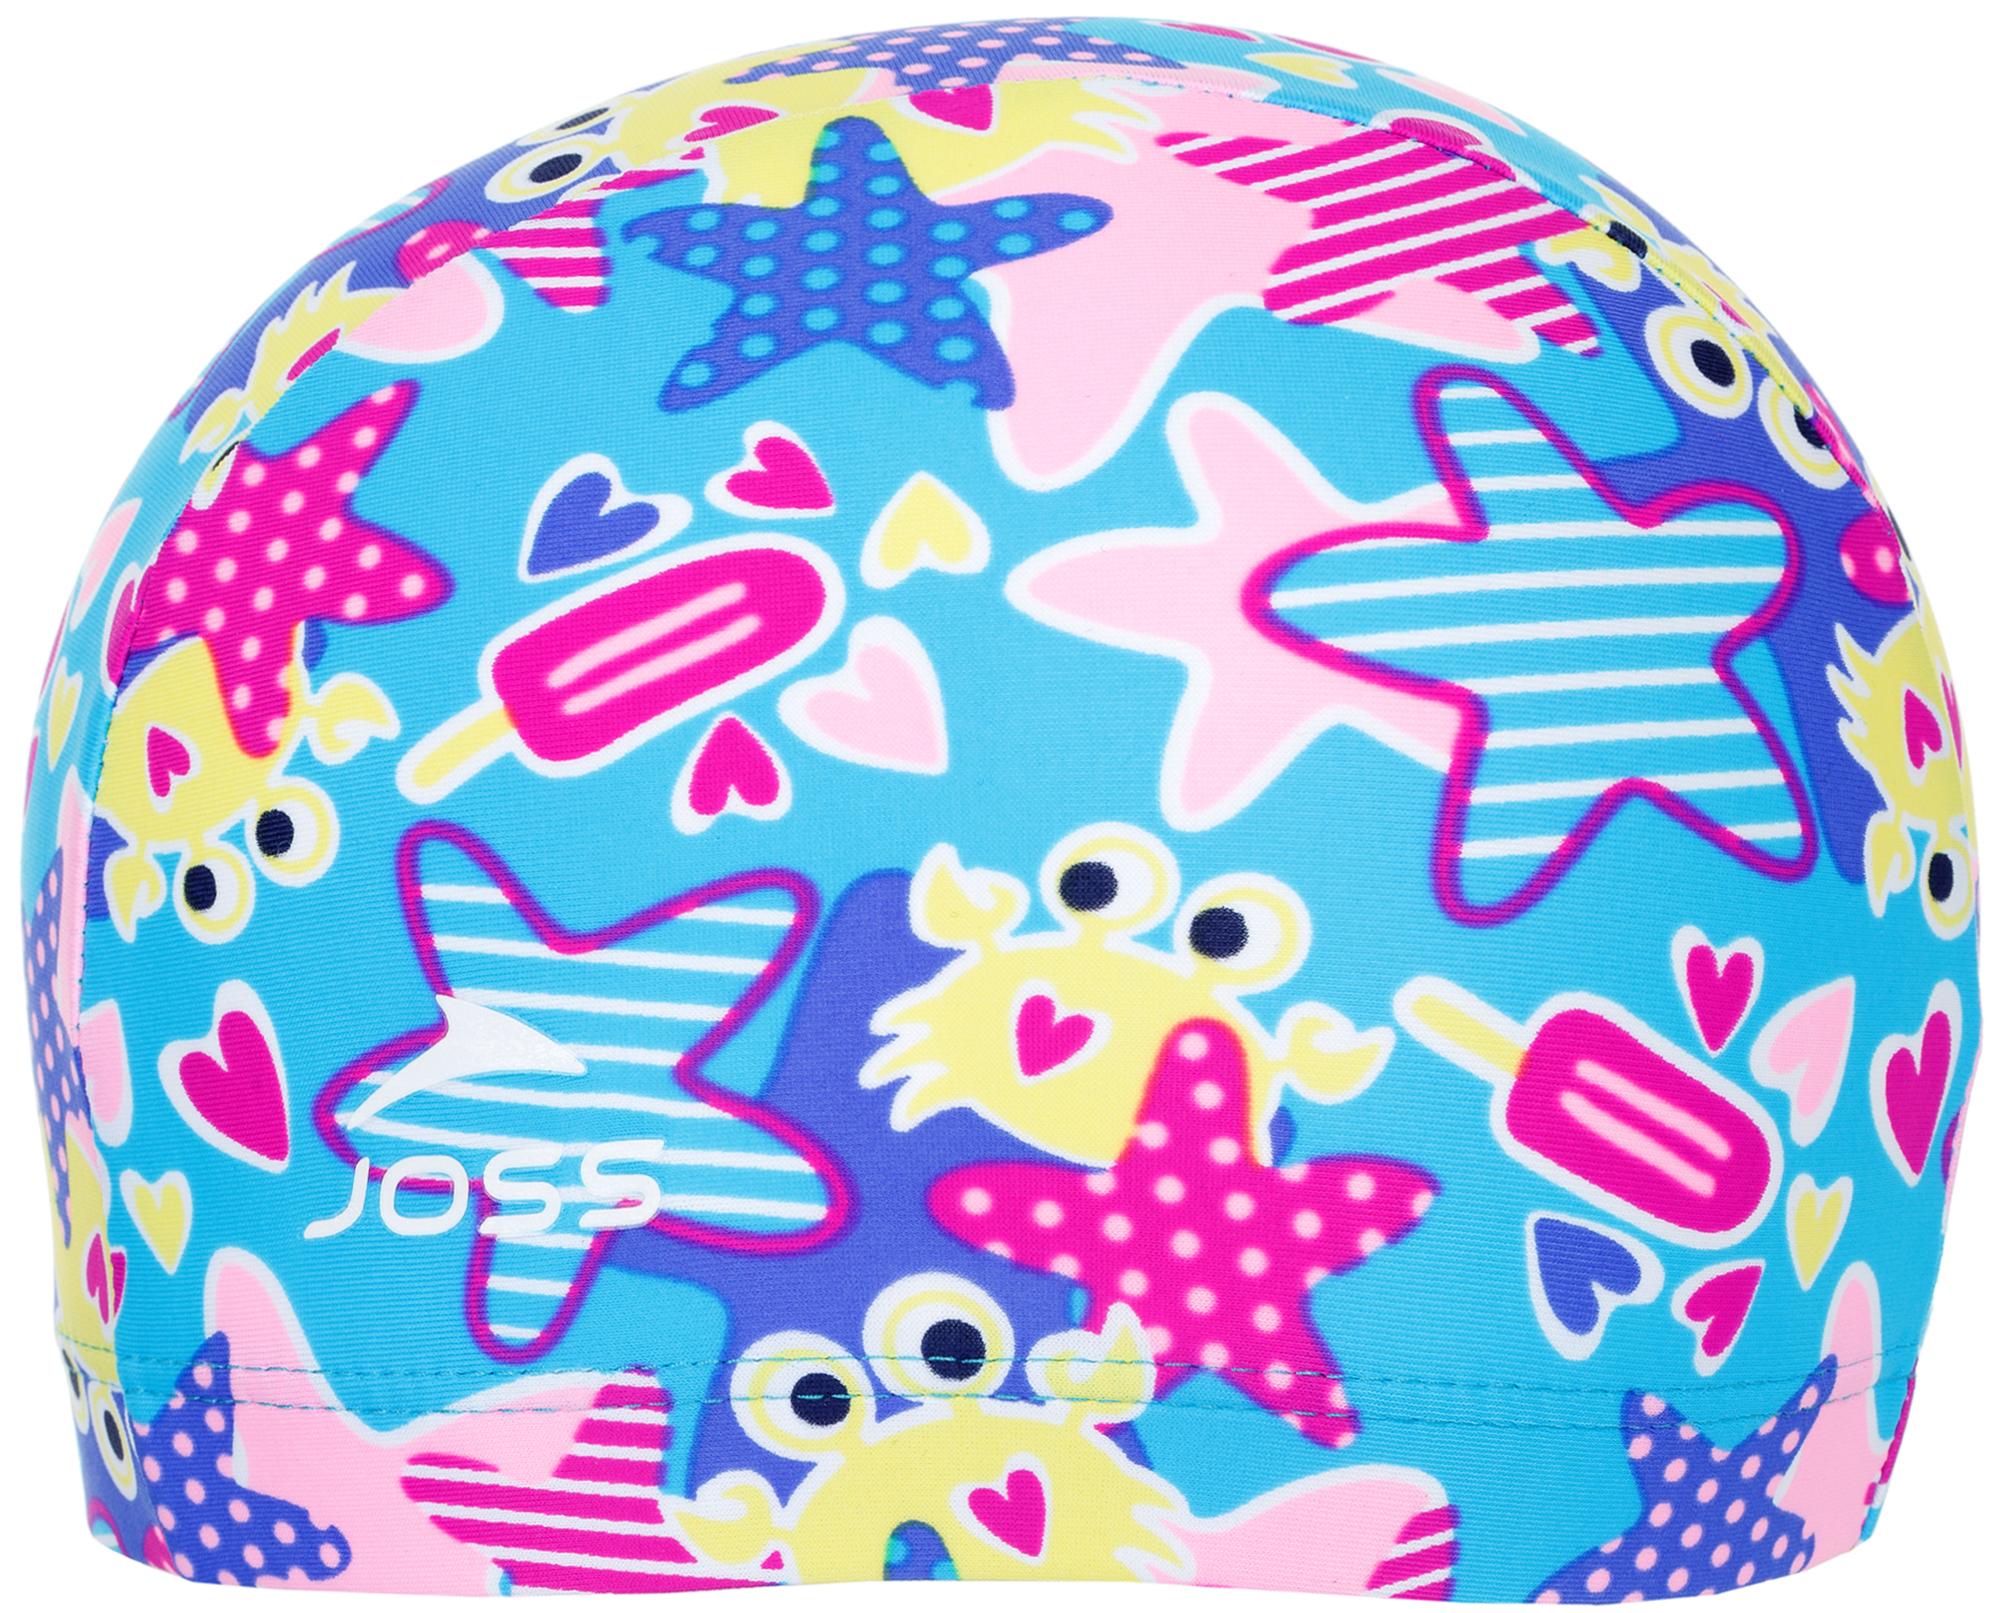 Joss Шапочка для плавания детская Joss аквапалку для плавания в барнауле